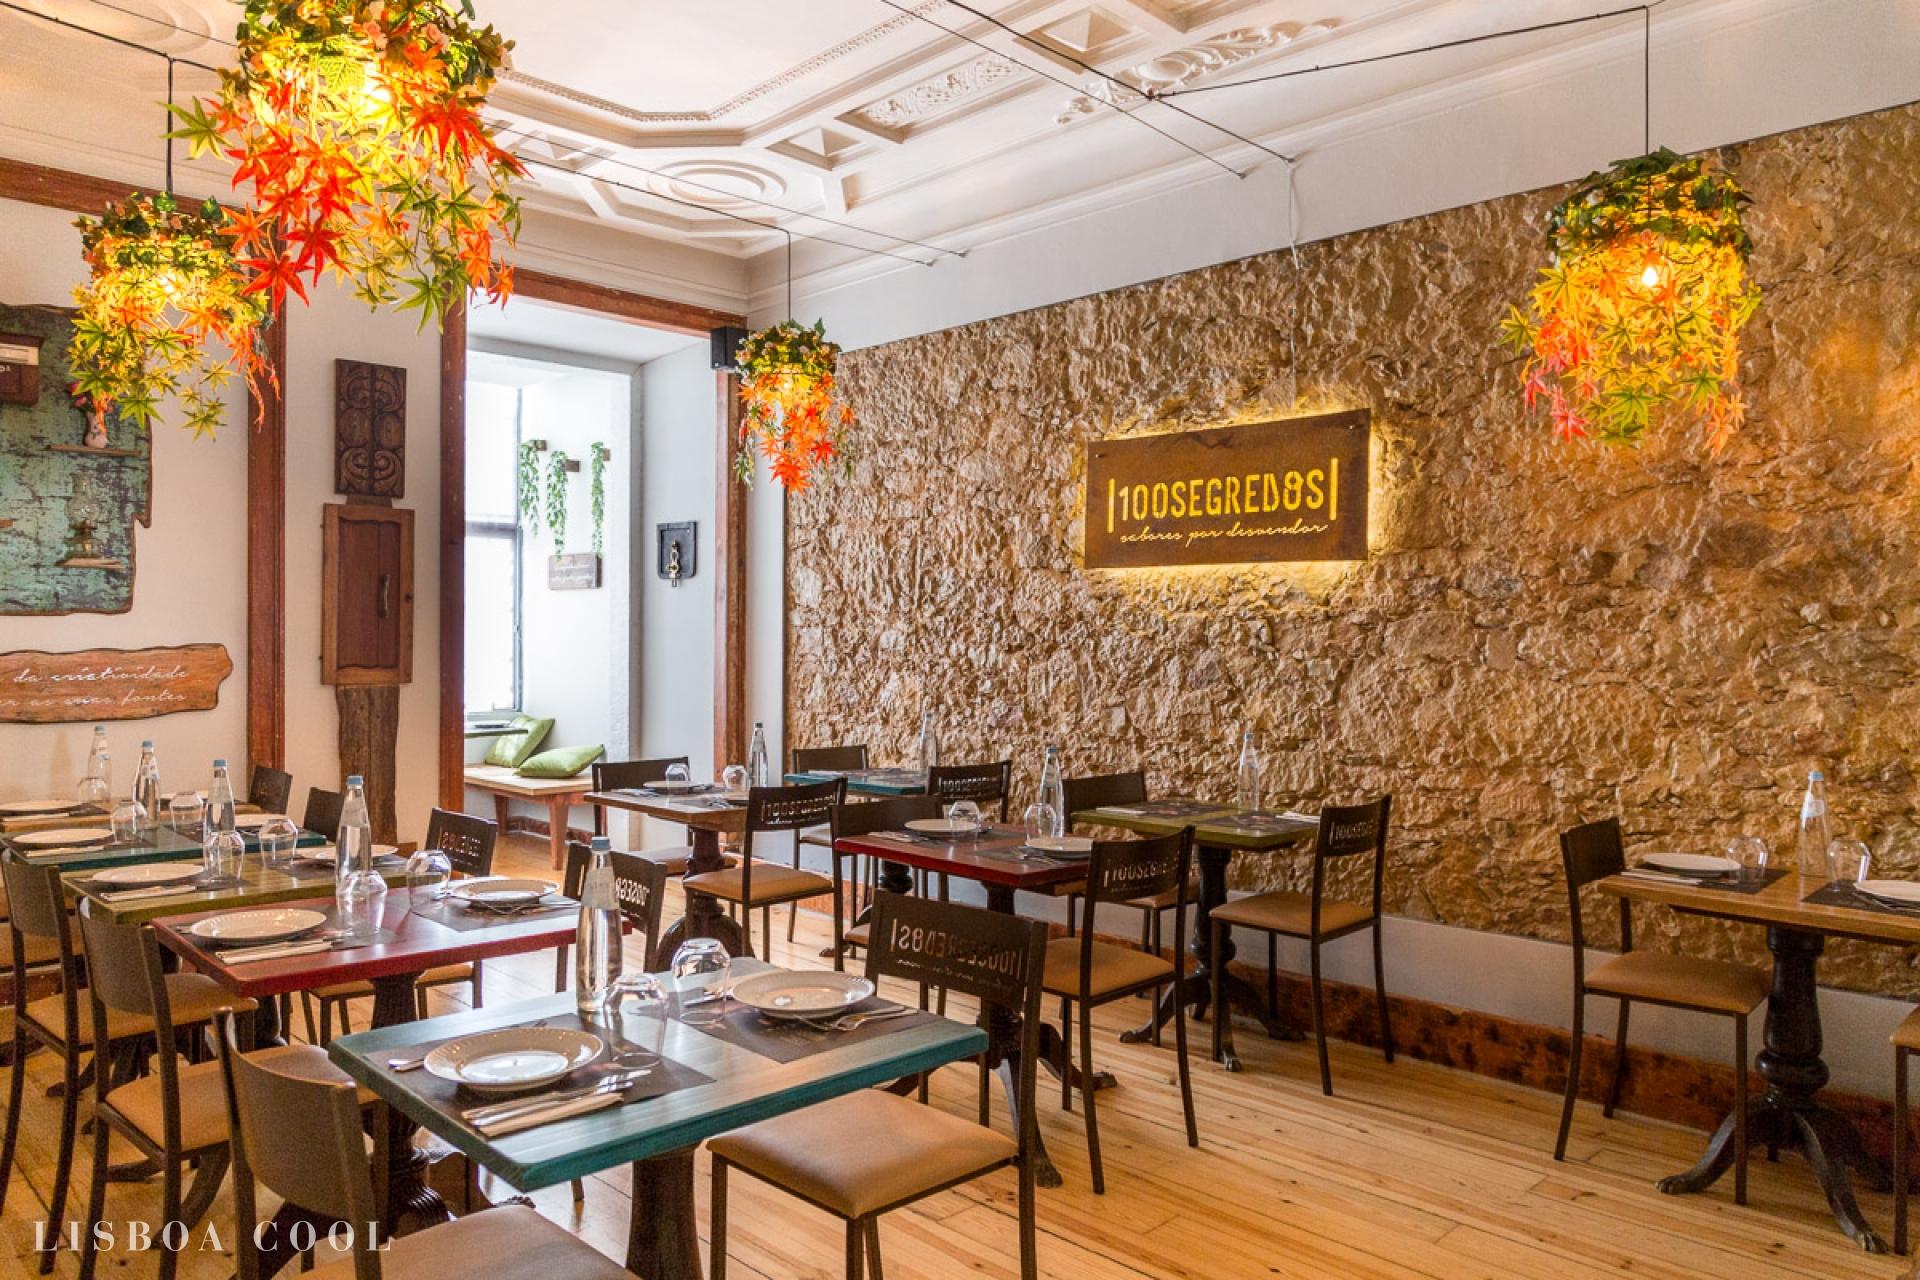 LisboaCool_Comer_Restaurante_100_Segredos